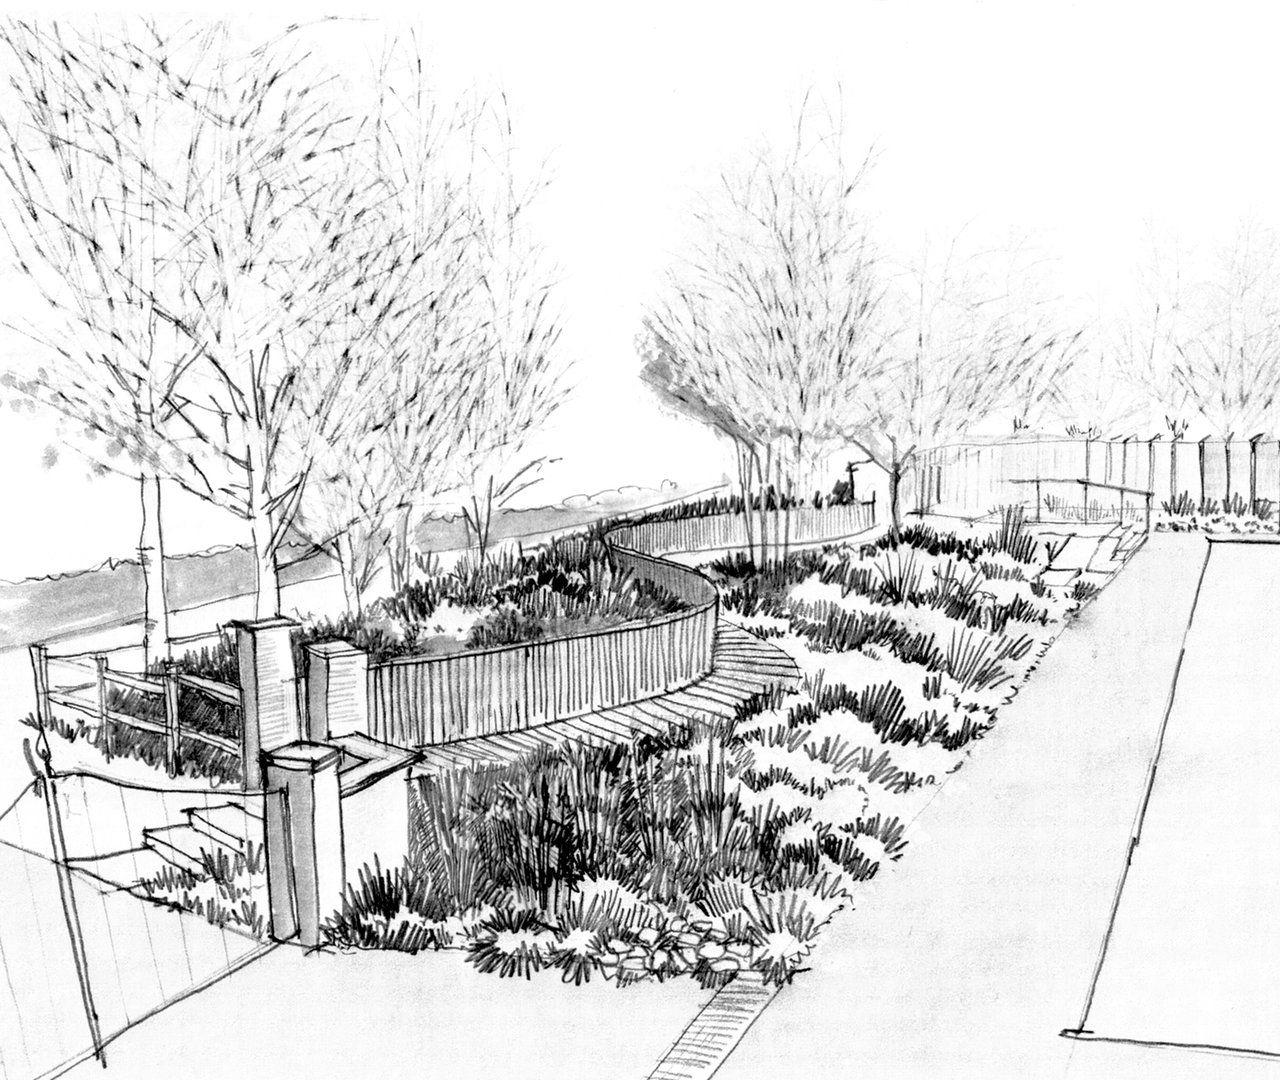 Landscape Architects: Landscape Architect Brighton